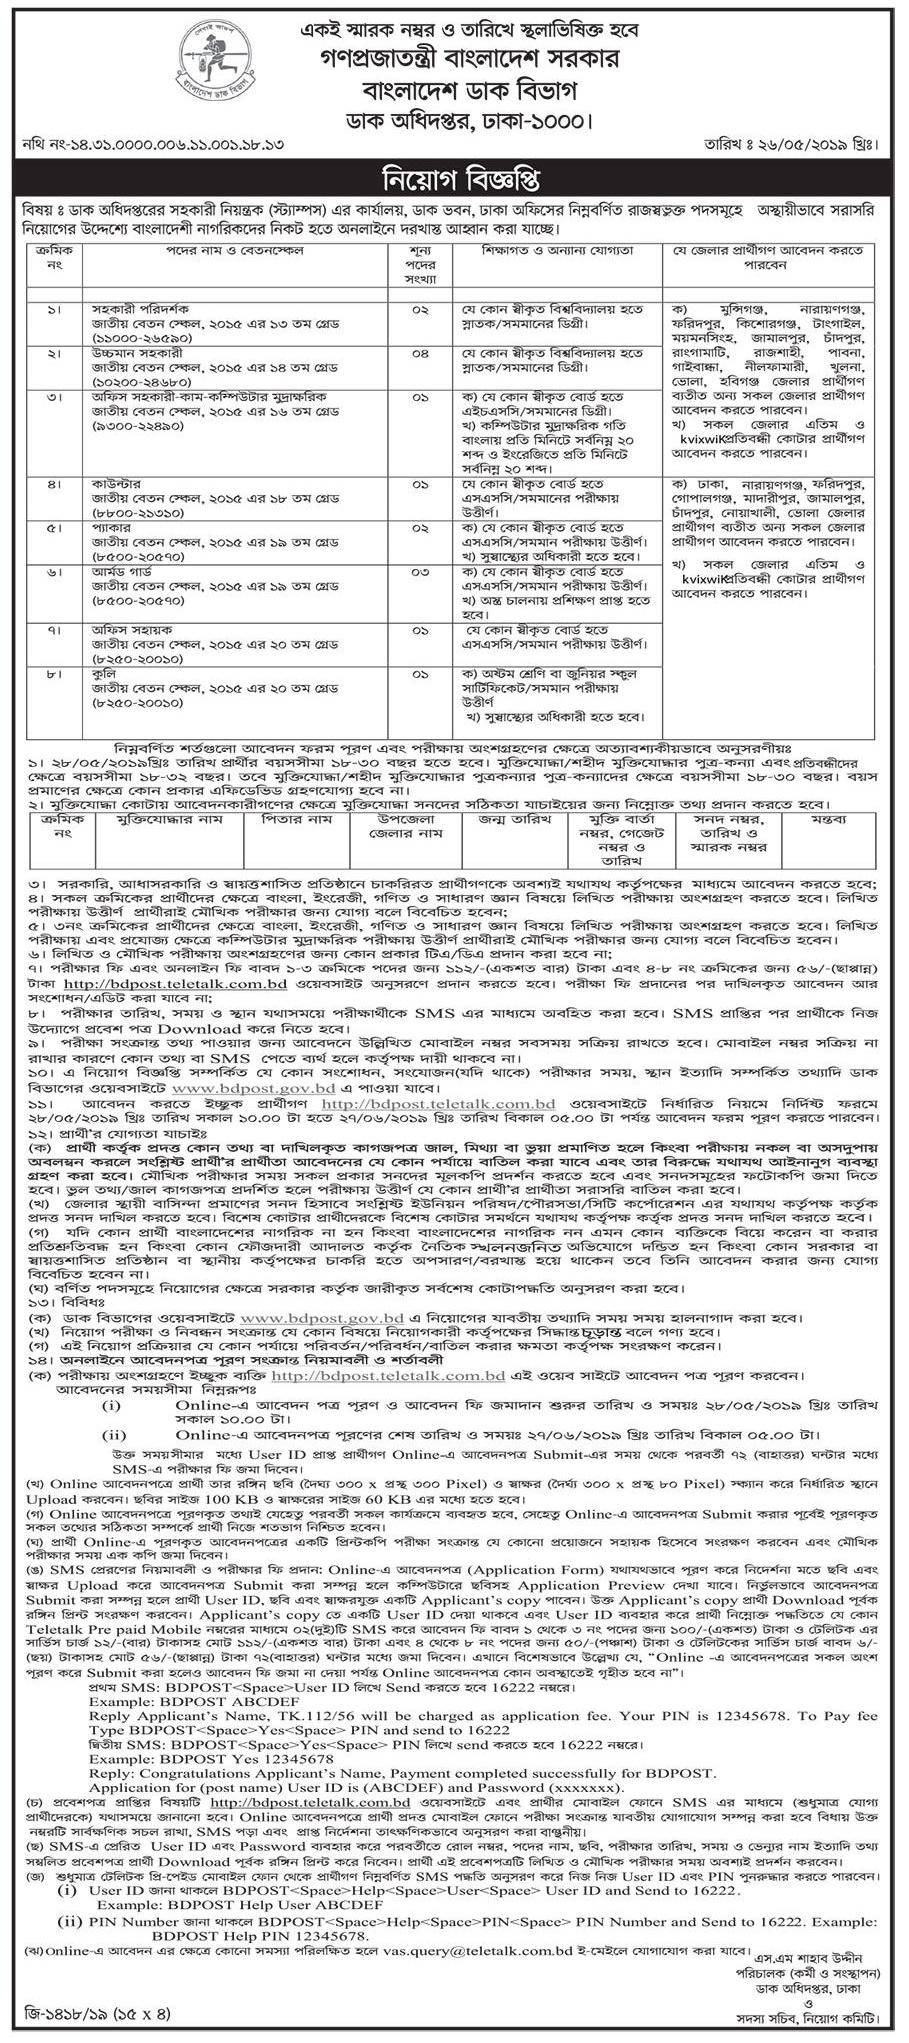 Post Office Job Circular 2019 Bangladesh - NewExamResult Com